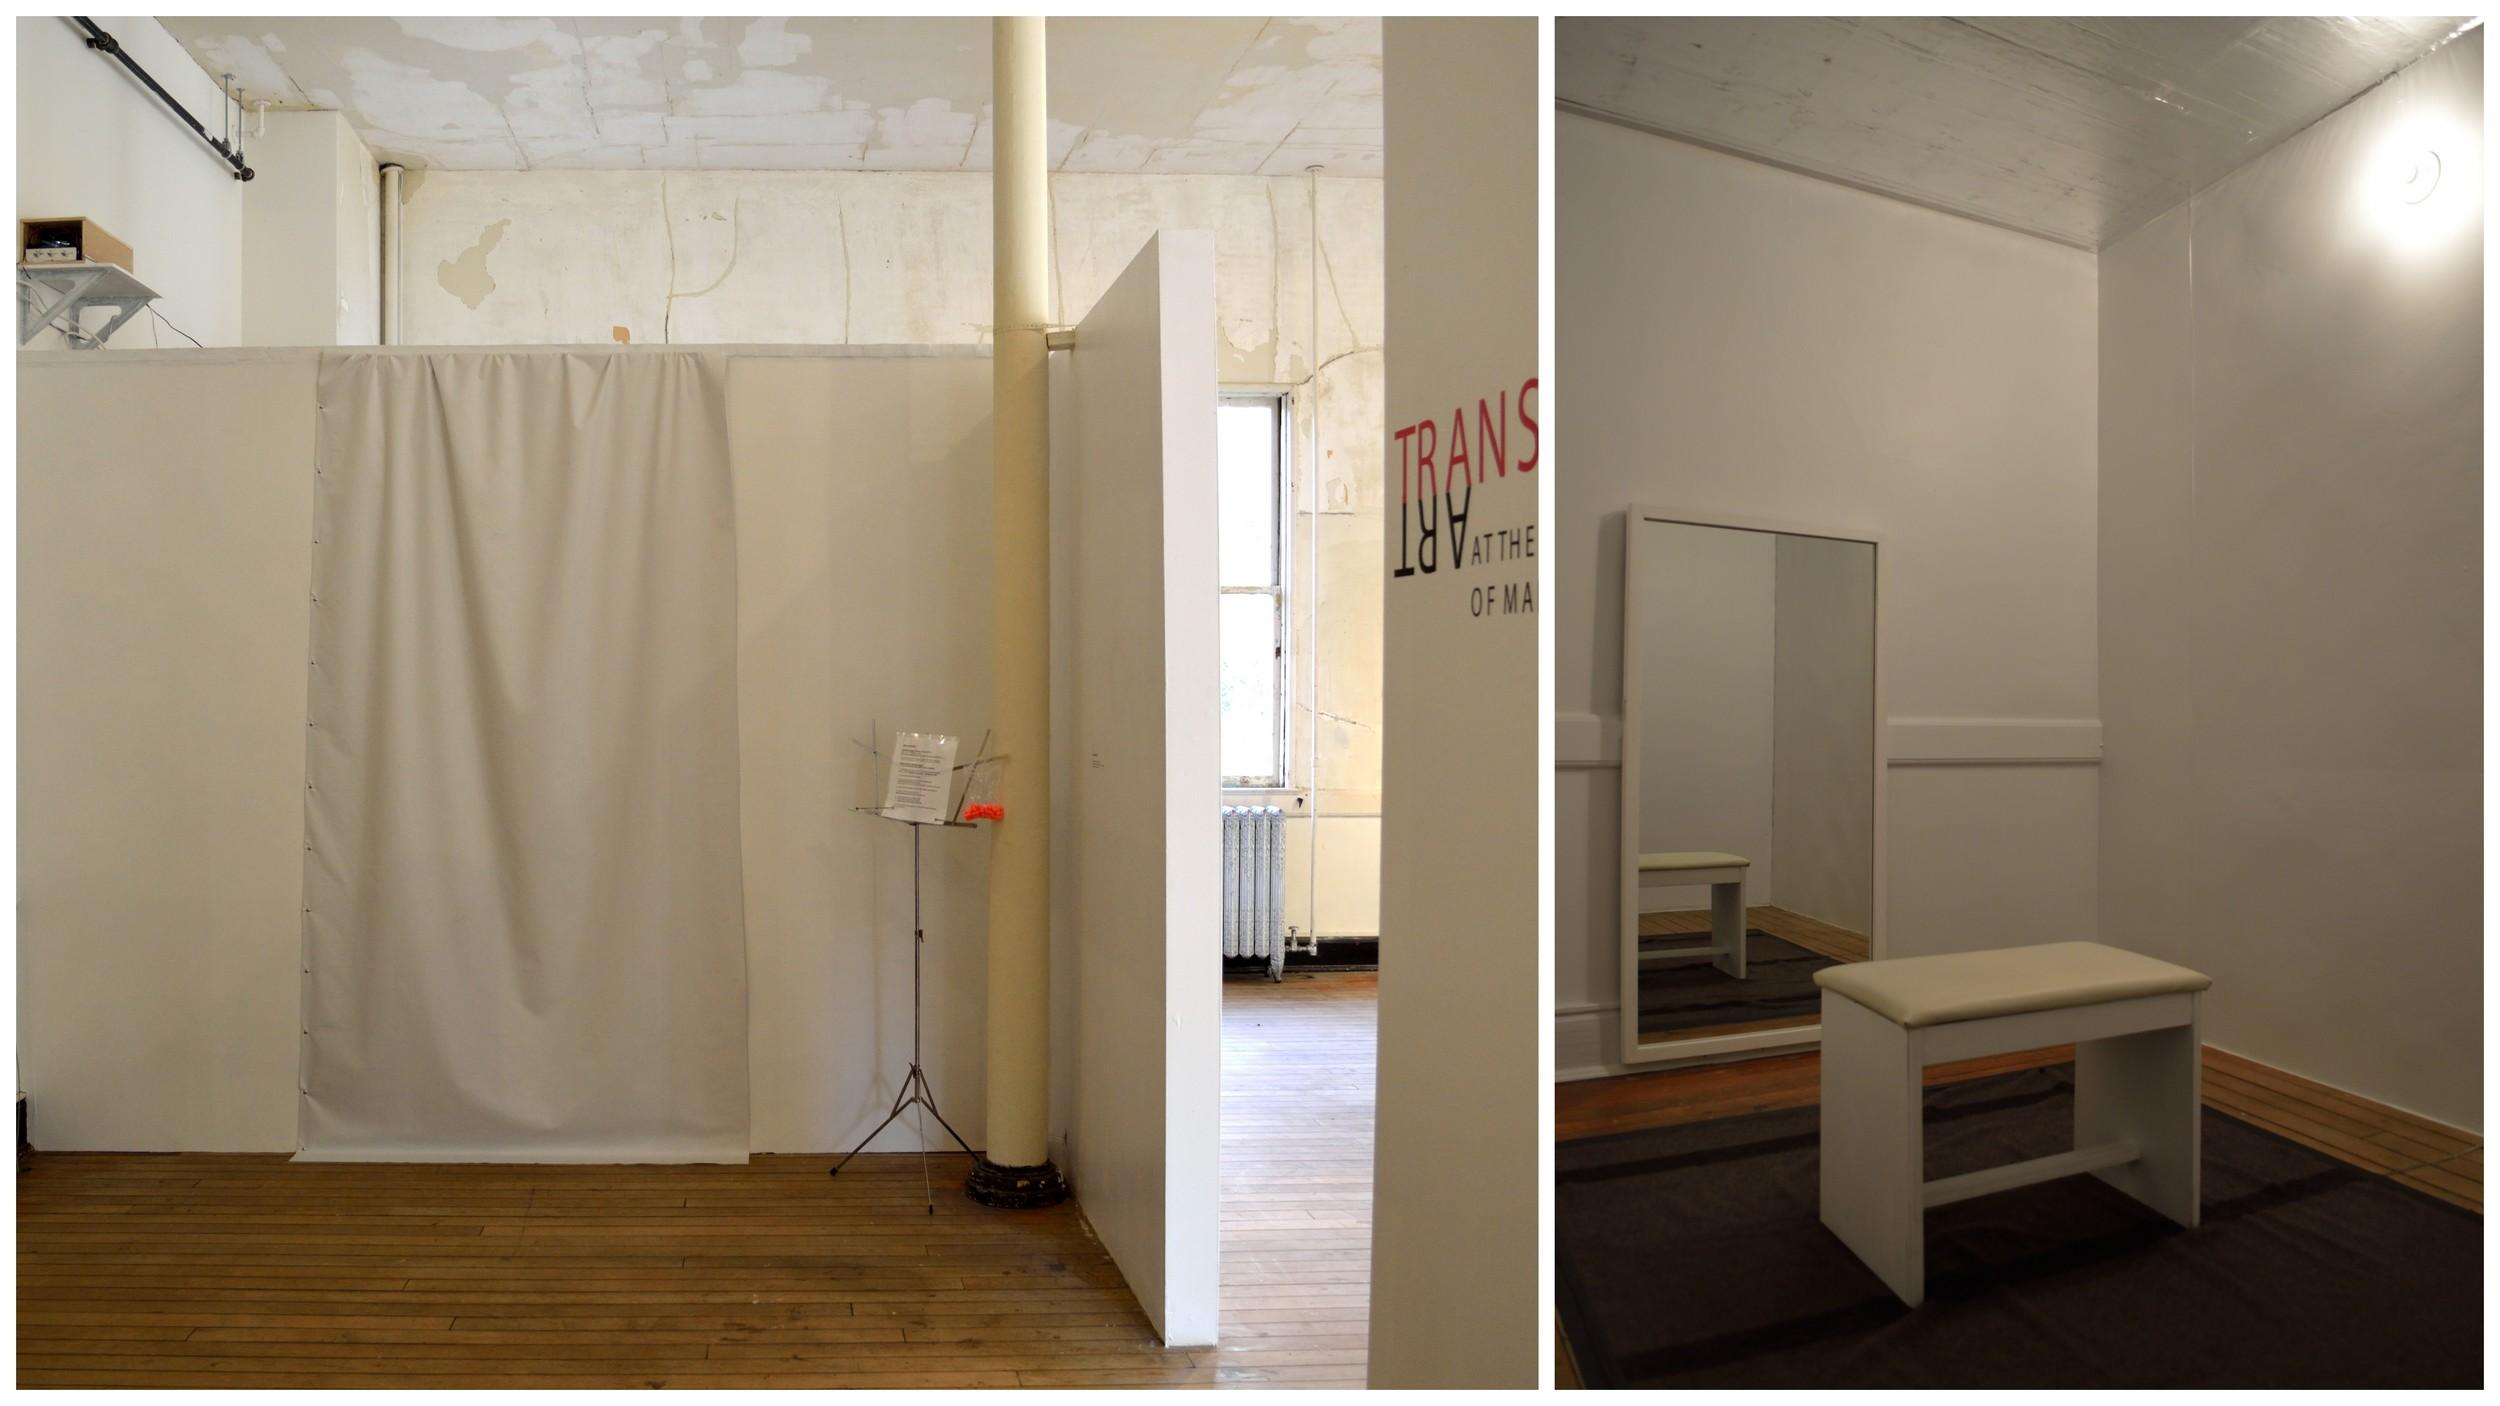 Untitled (disappear darkroom, Version B)